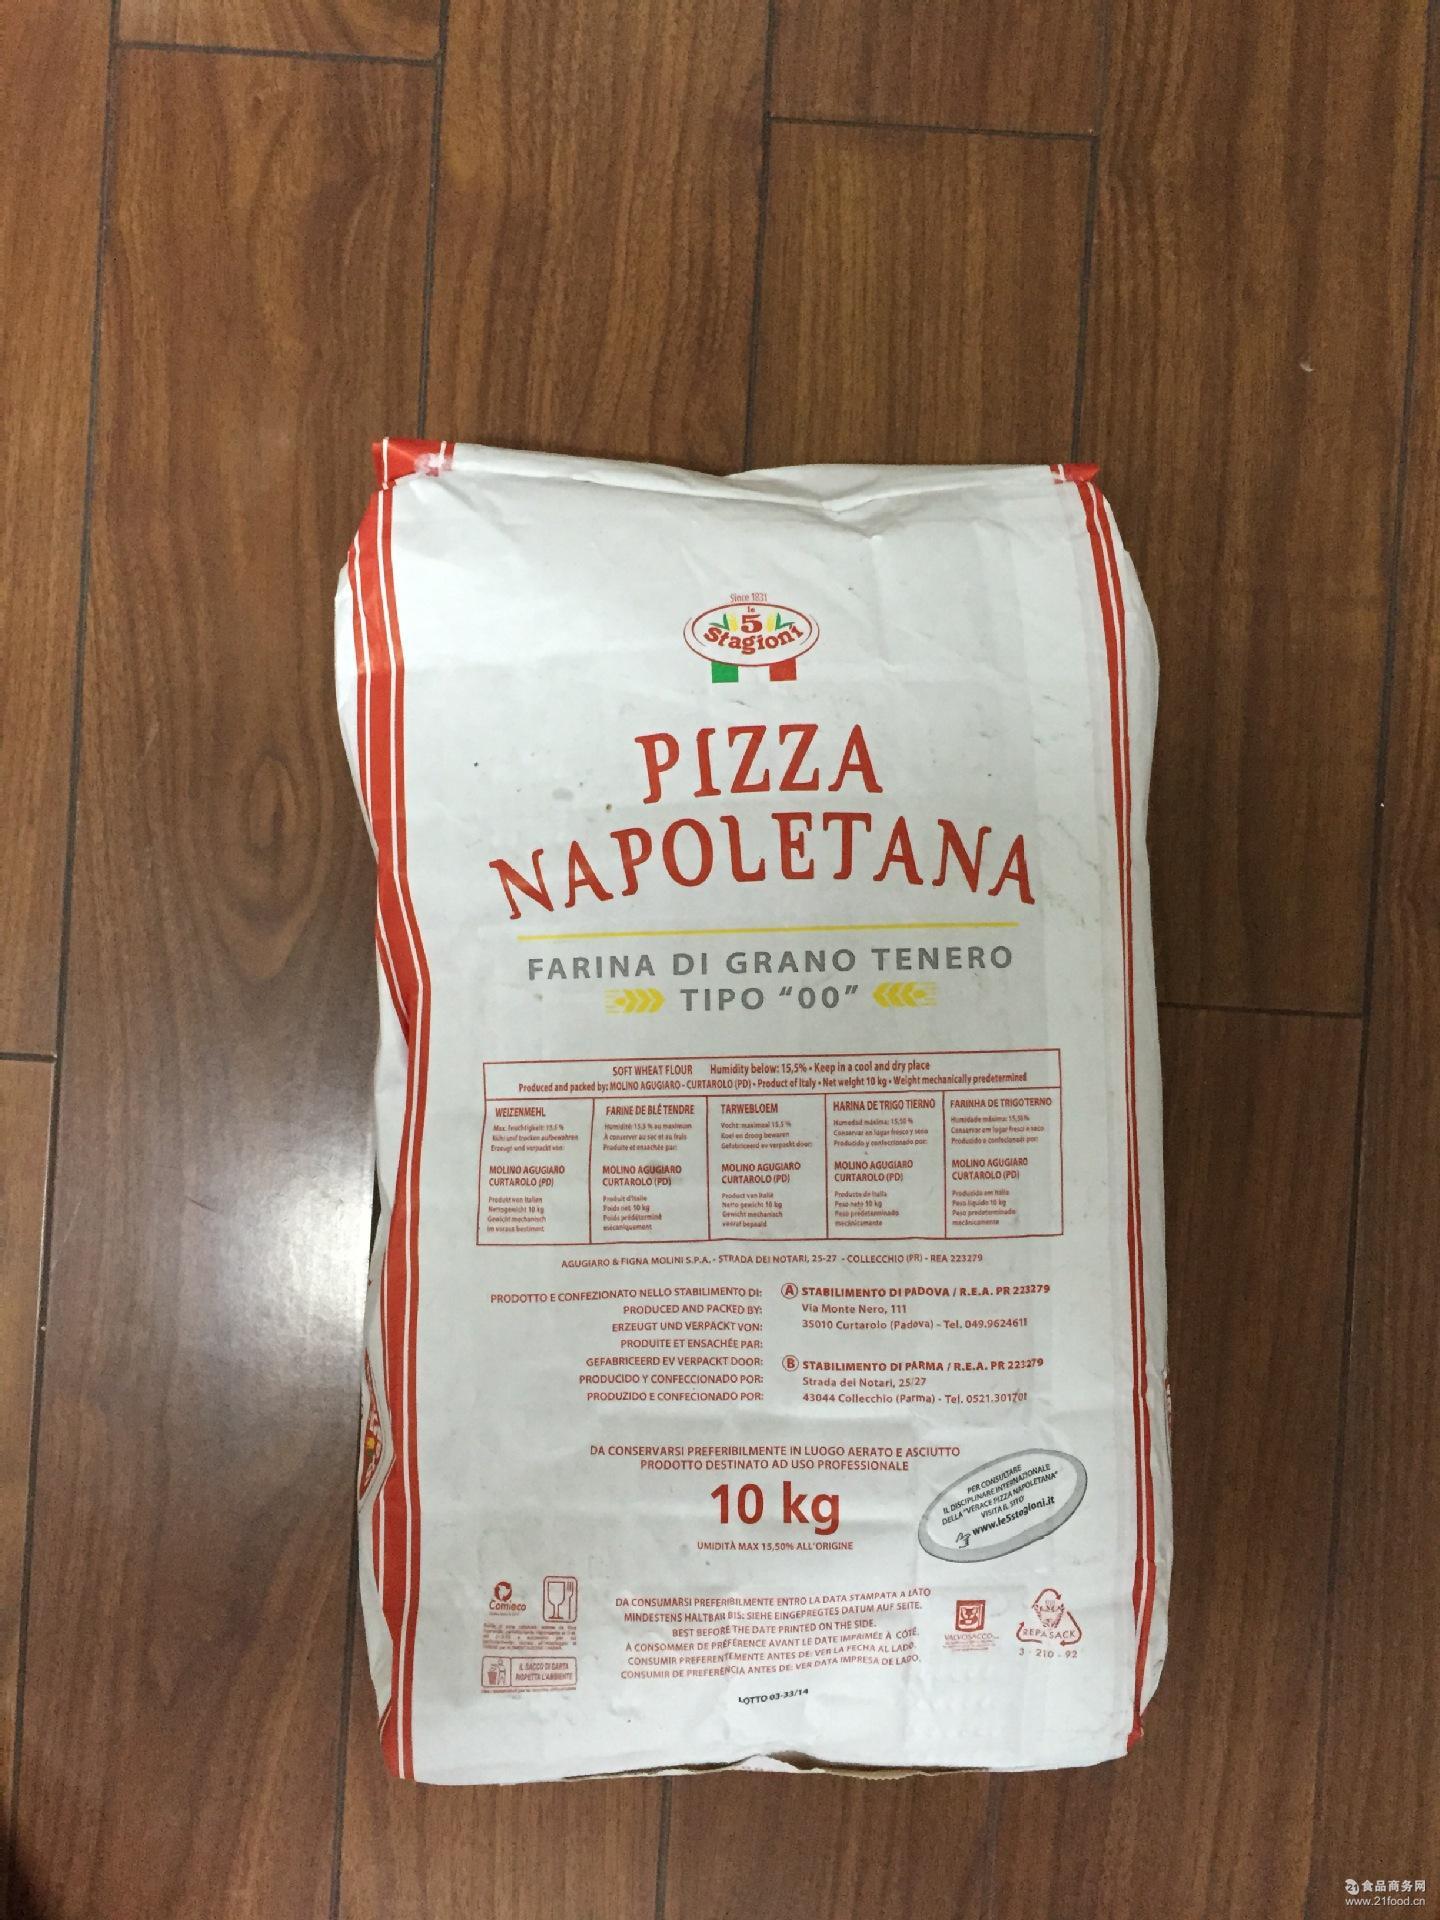 10KG 披萨小麦面粉 烘培原料 法粒纳00匹萨预拌粉